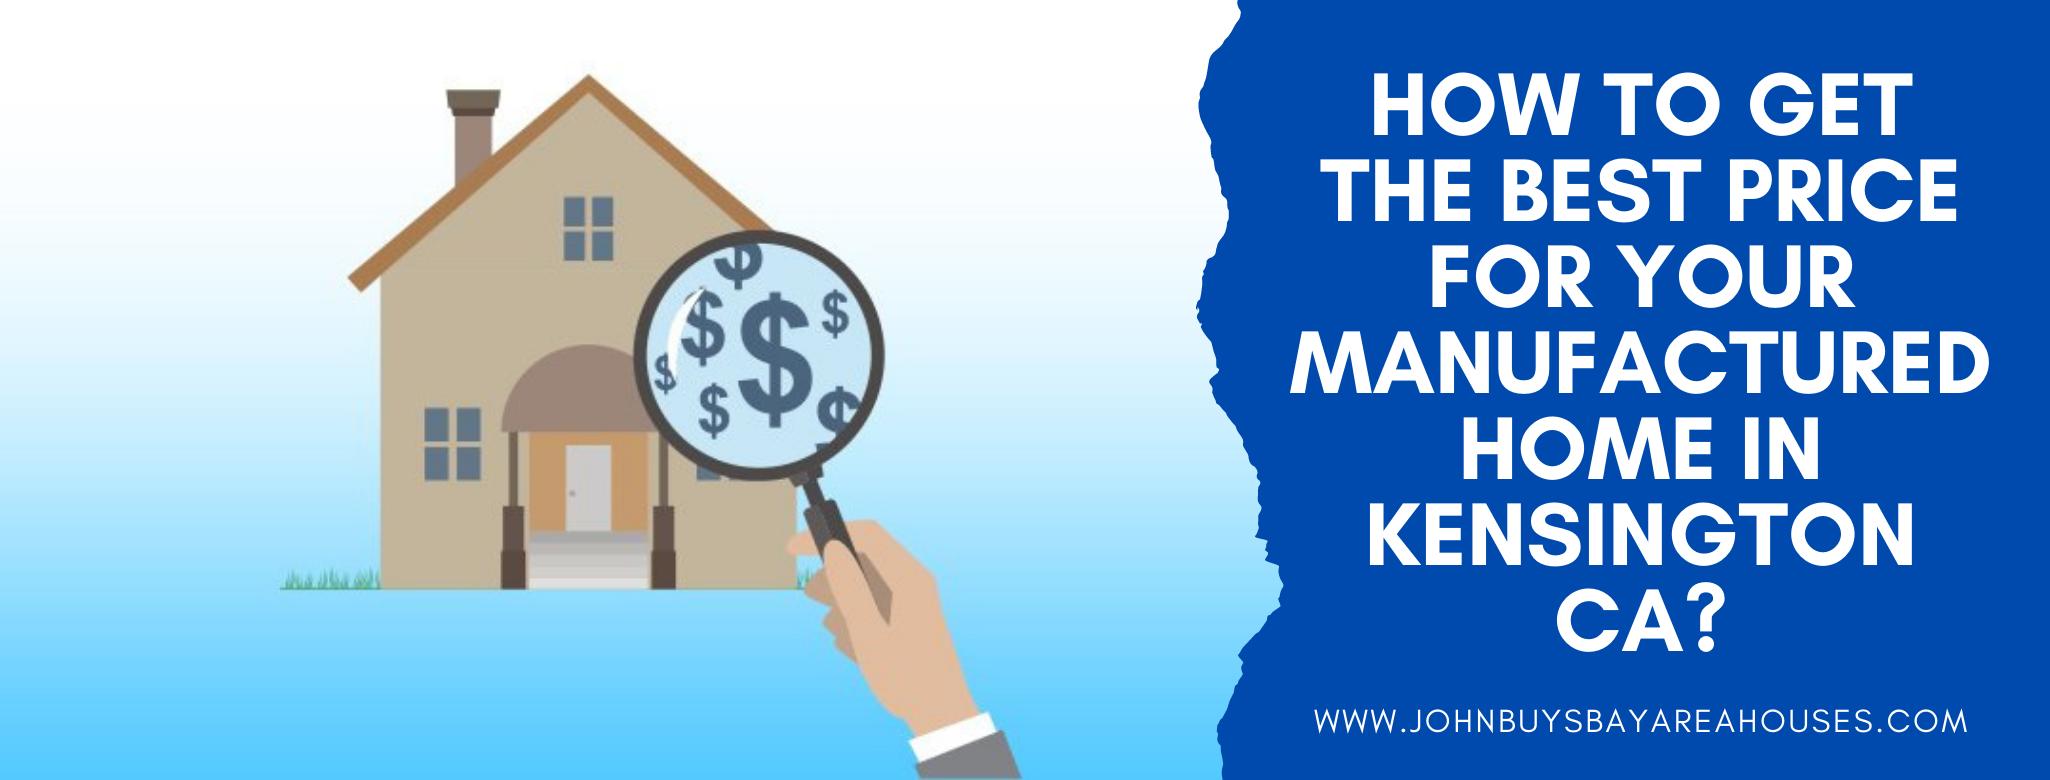 We buy properties in Kensington CA